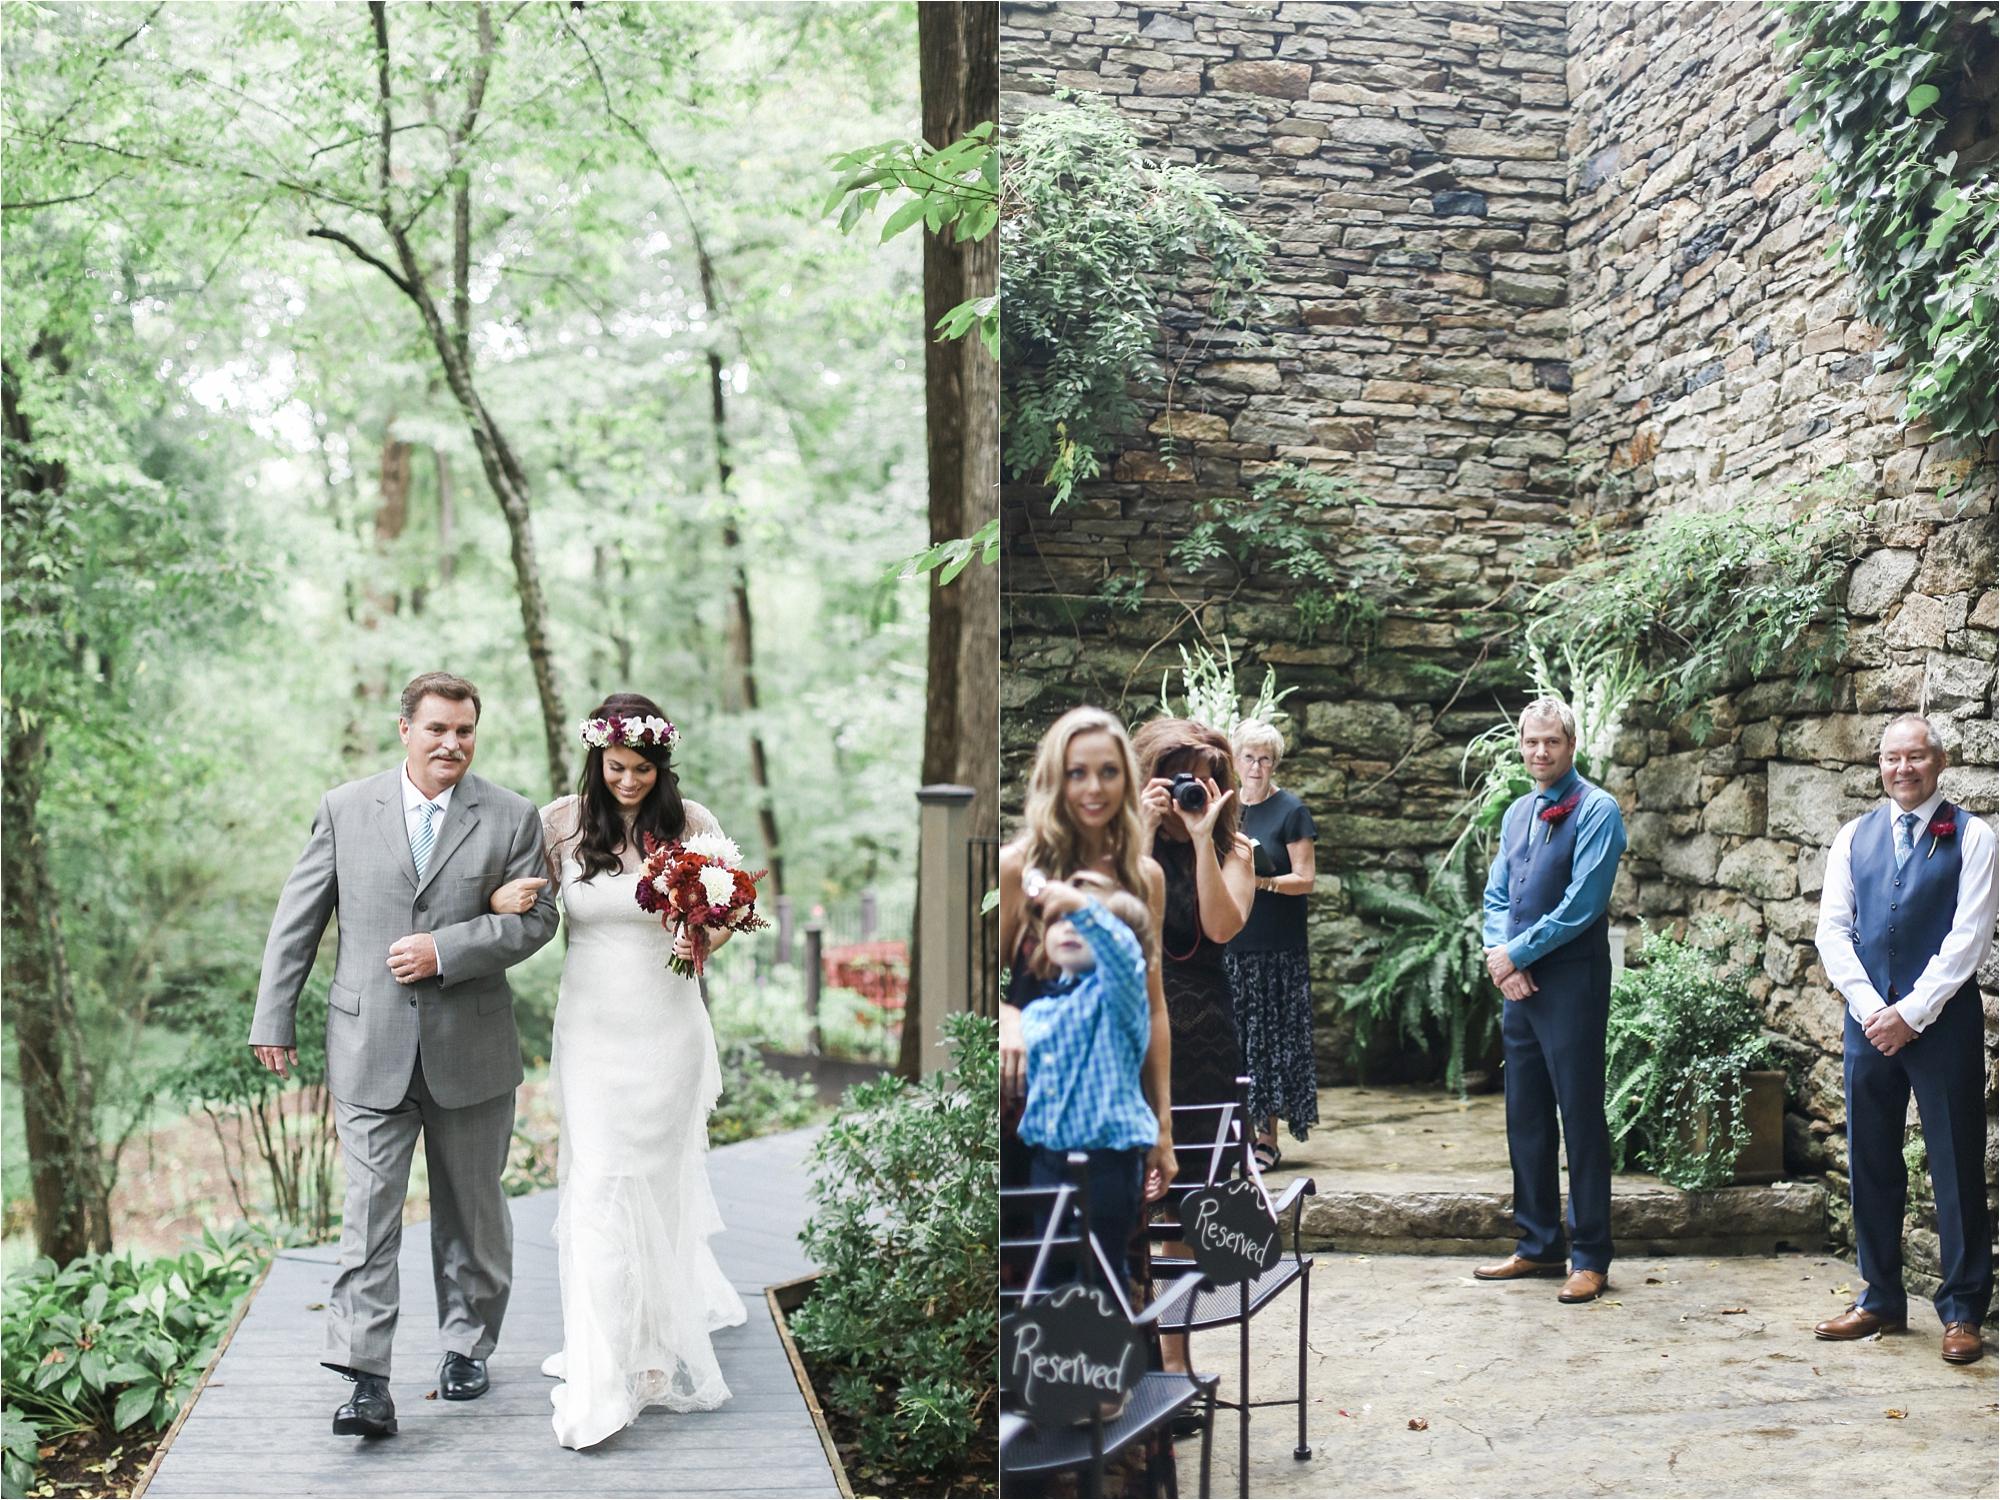 stephanie-yonce-photography-richmond-virginia-bohemian-outdoor-wedding-photo_0015.jpg